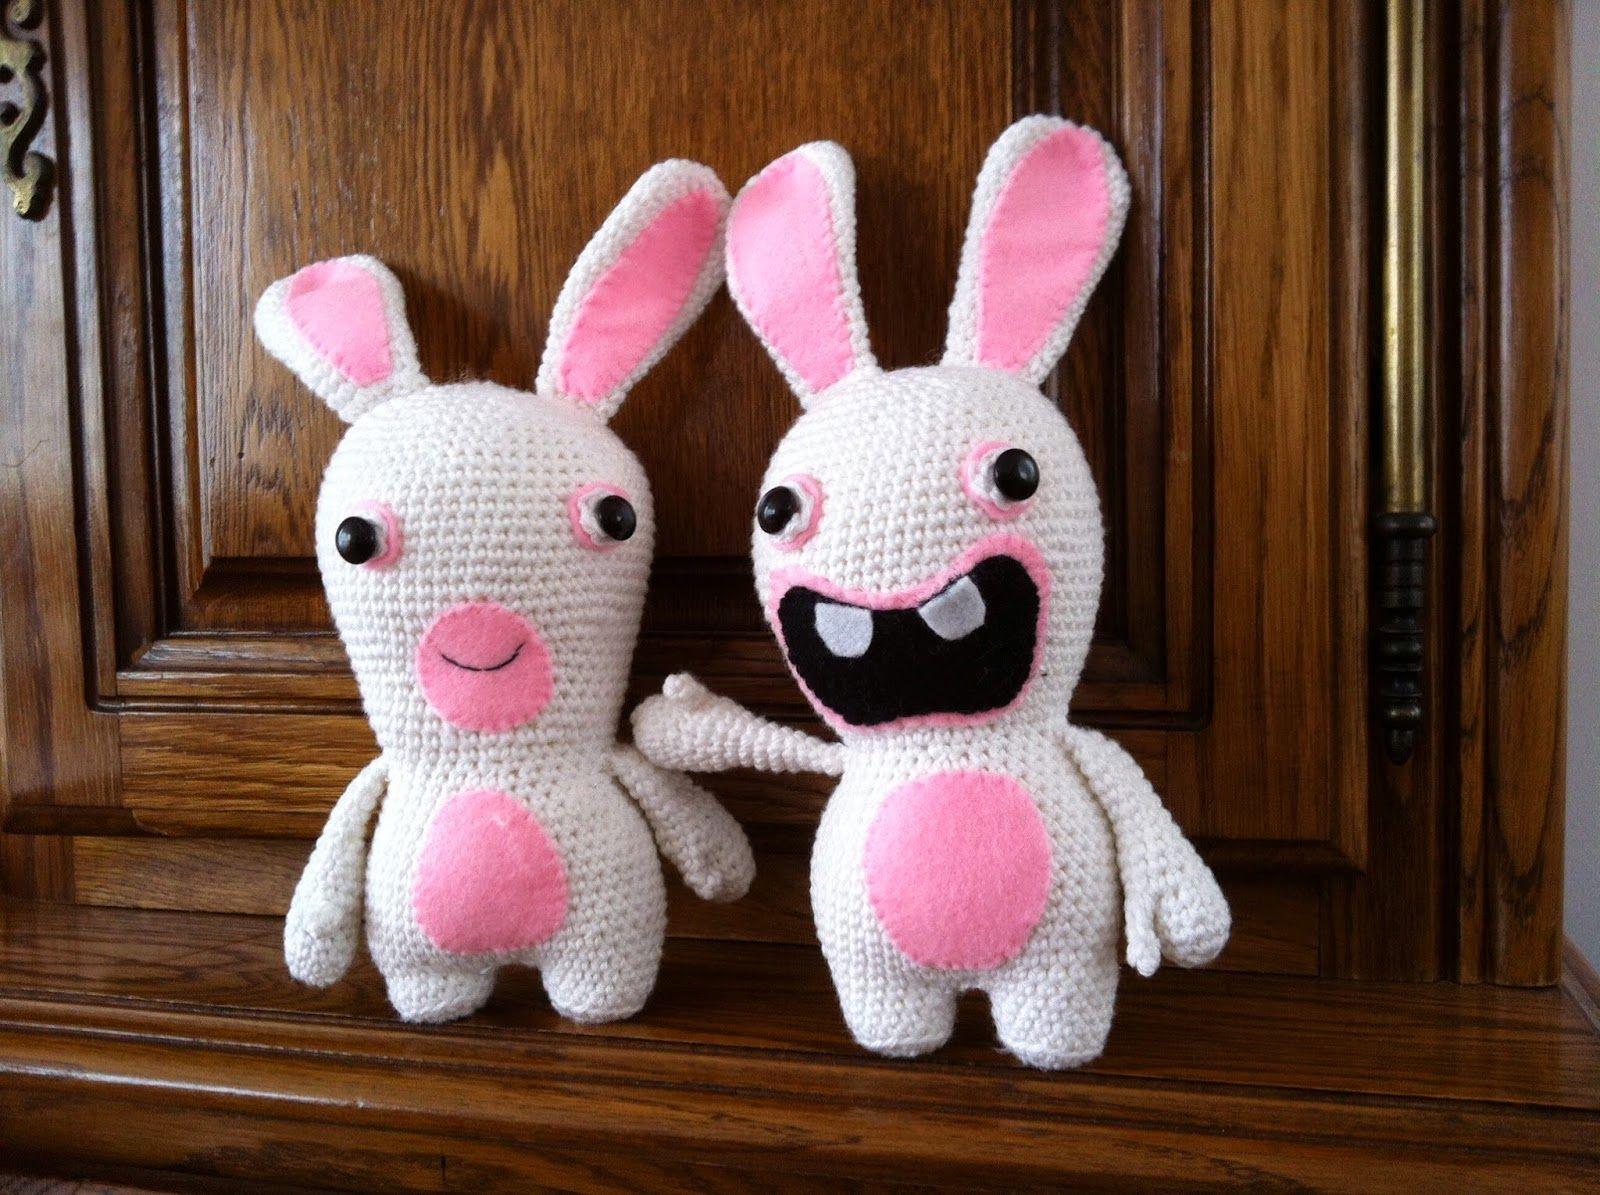 Lapin Cretin Au Crochet Lapin Cretin Crochet Lapin